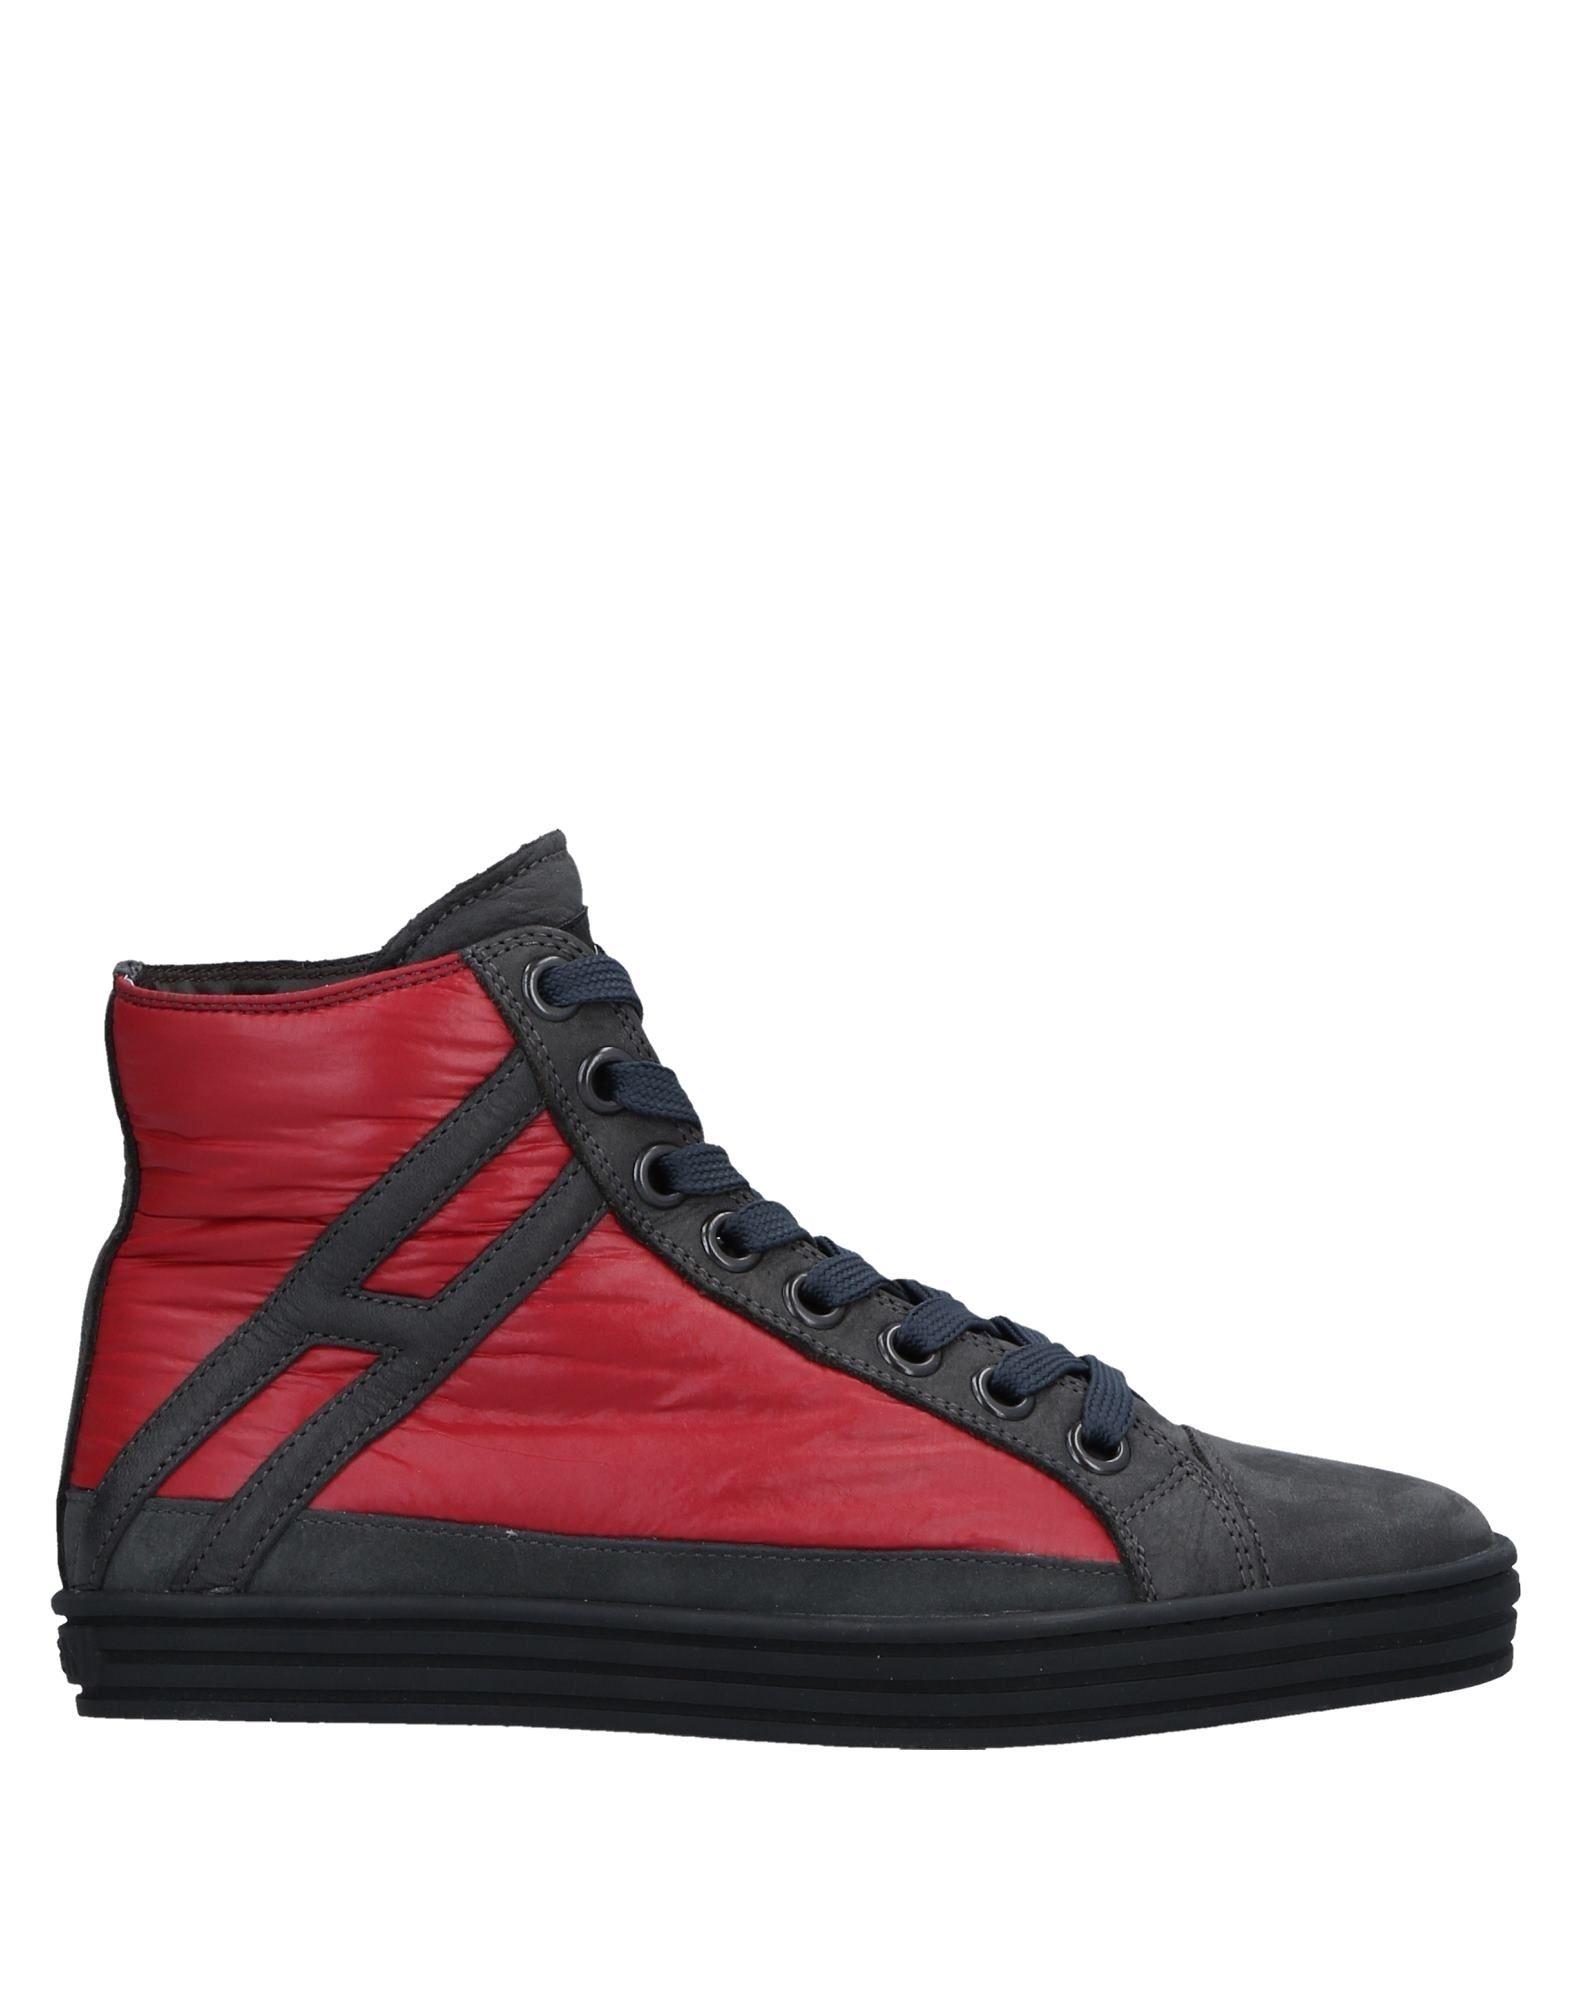 Hogan Rebel Sneakers Damen  11539987TBGut aussehende strapazierfähige Schuhe